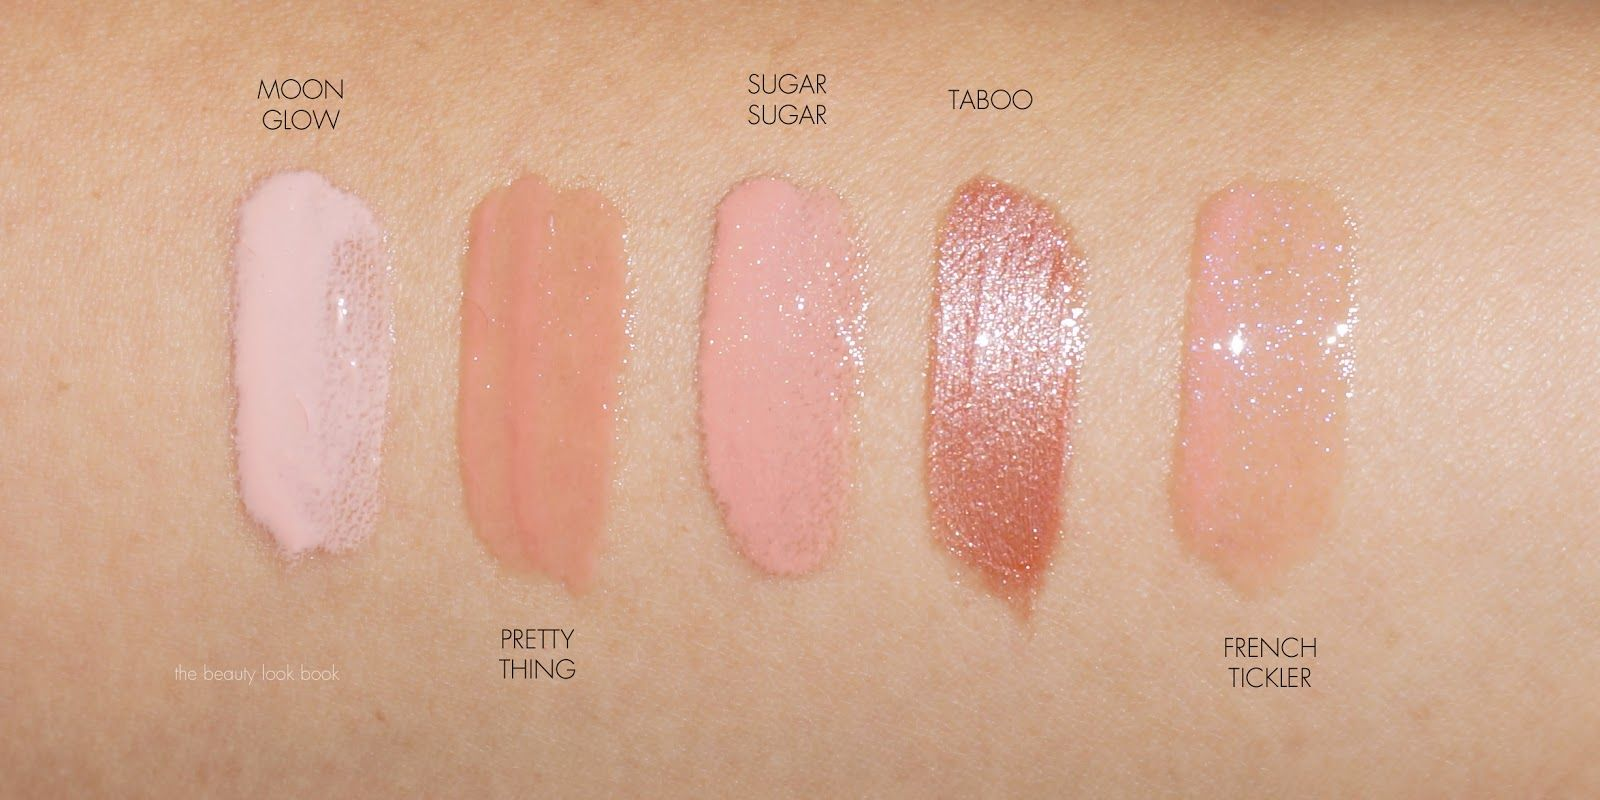 Enamored Lip Hi-Shine Gloss Lip Lacquer by Marc Jacobs Beauty #19